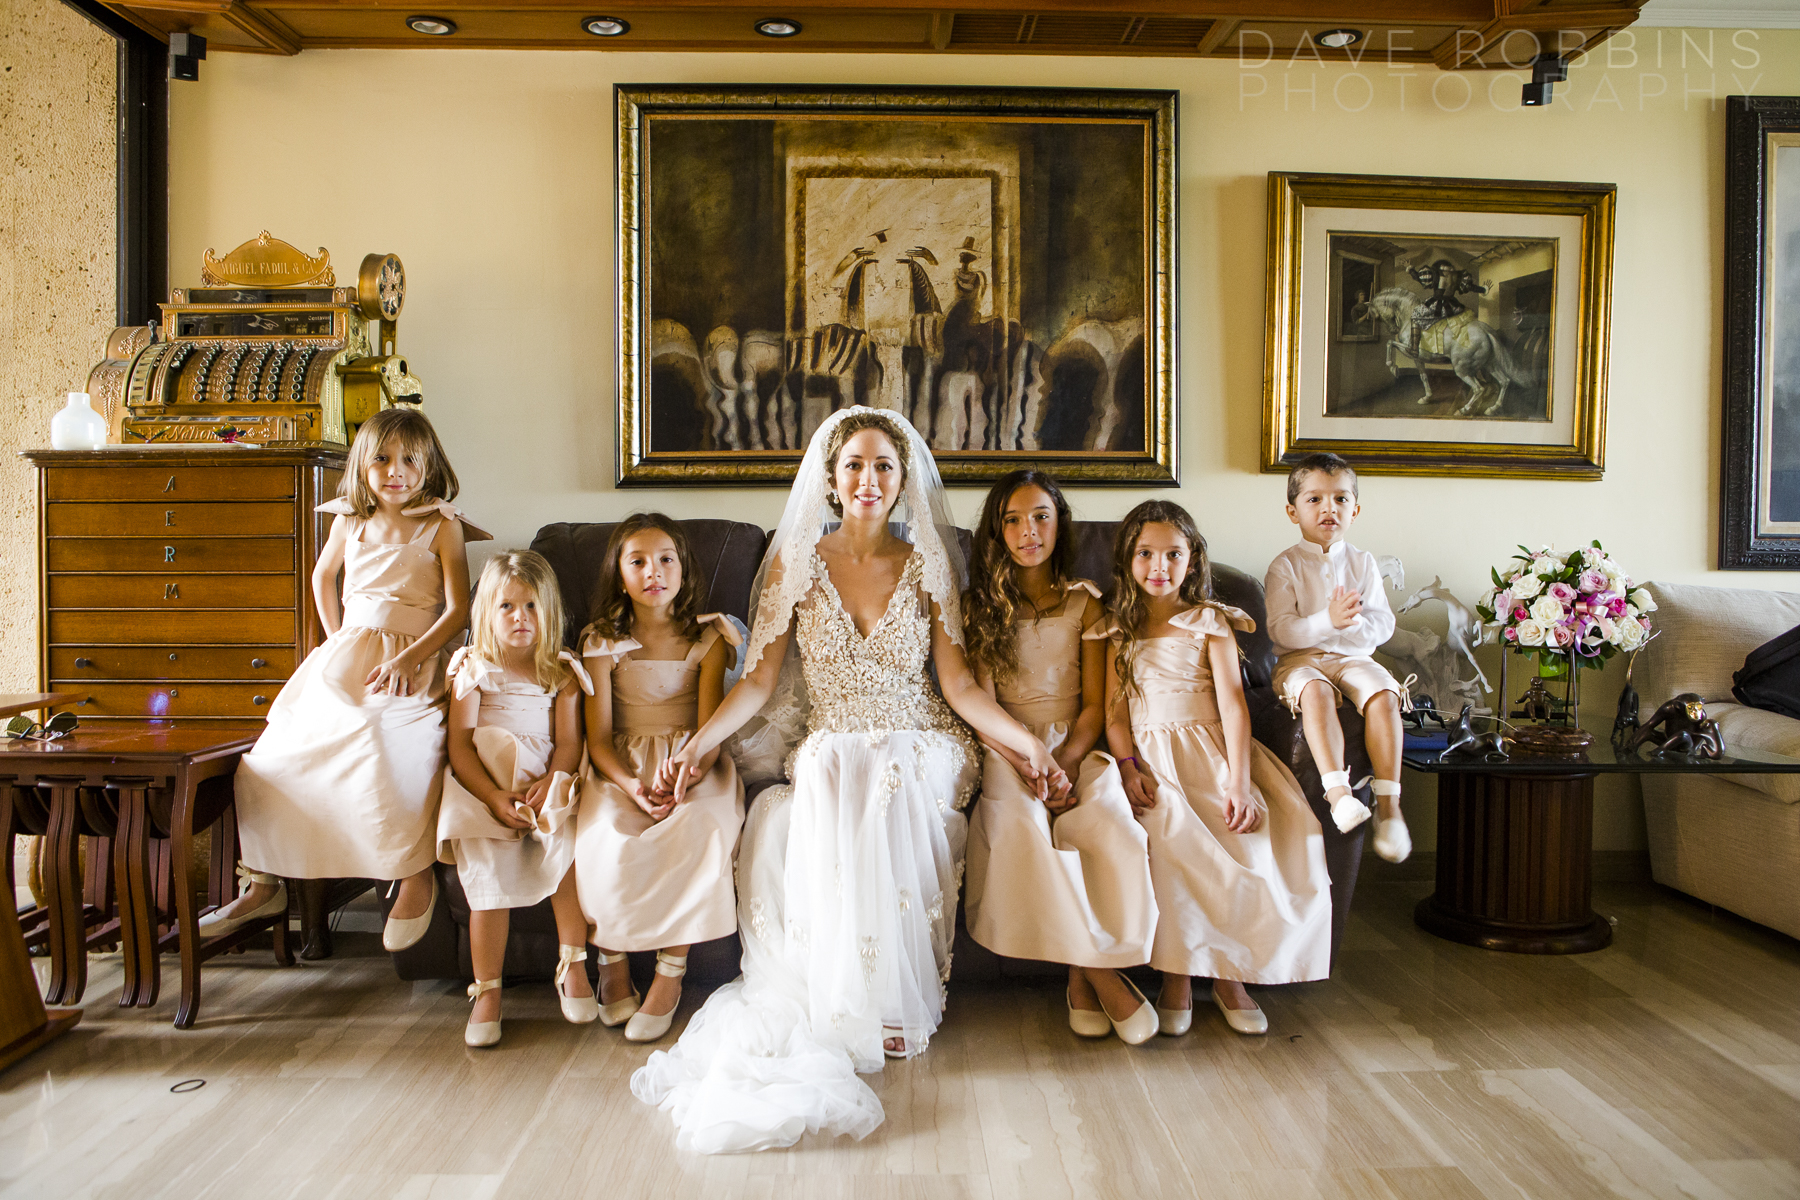 CARTAGENA WEDDING MARTHA STEWART - 0036.JPG